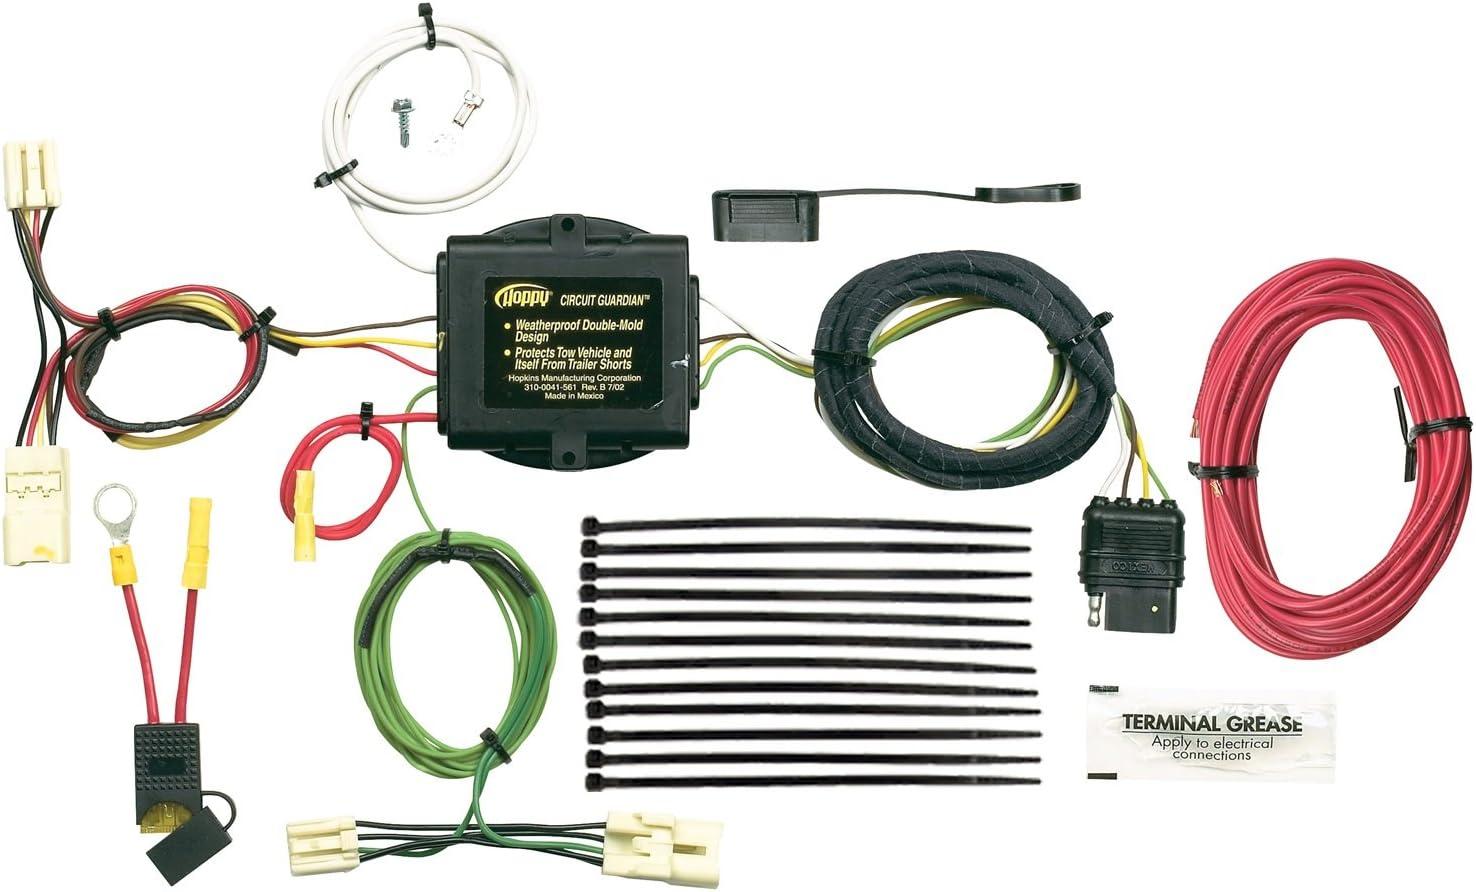 amazon.com: hopkins 43445 vehicle to trailer wiring kit for toyota rav4:  automotive  amazon.com